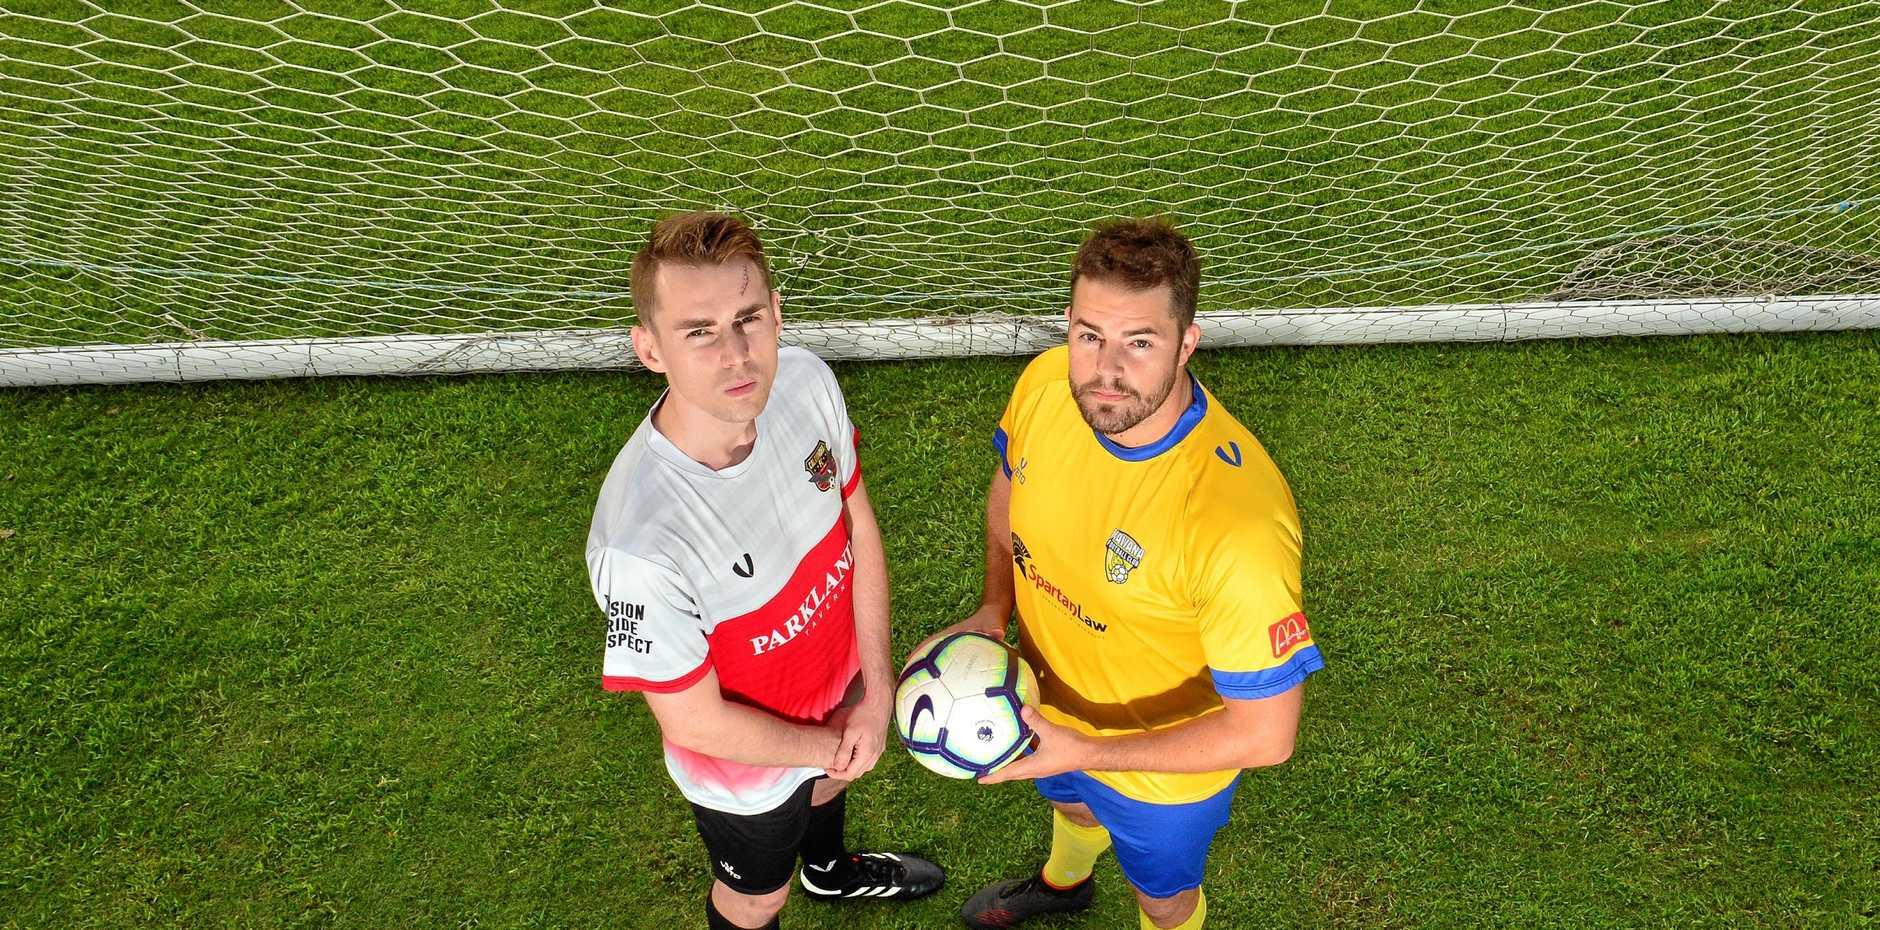 Caloundra captains Joe Hirst and Kawana captain Shane Dix prepare for the Lachlan Wells Charity Shield.